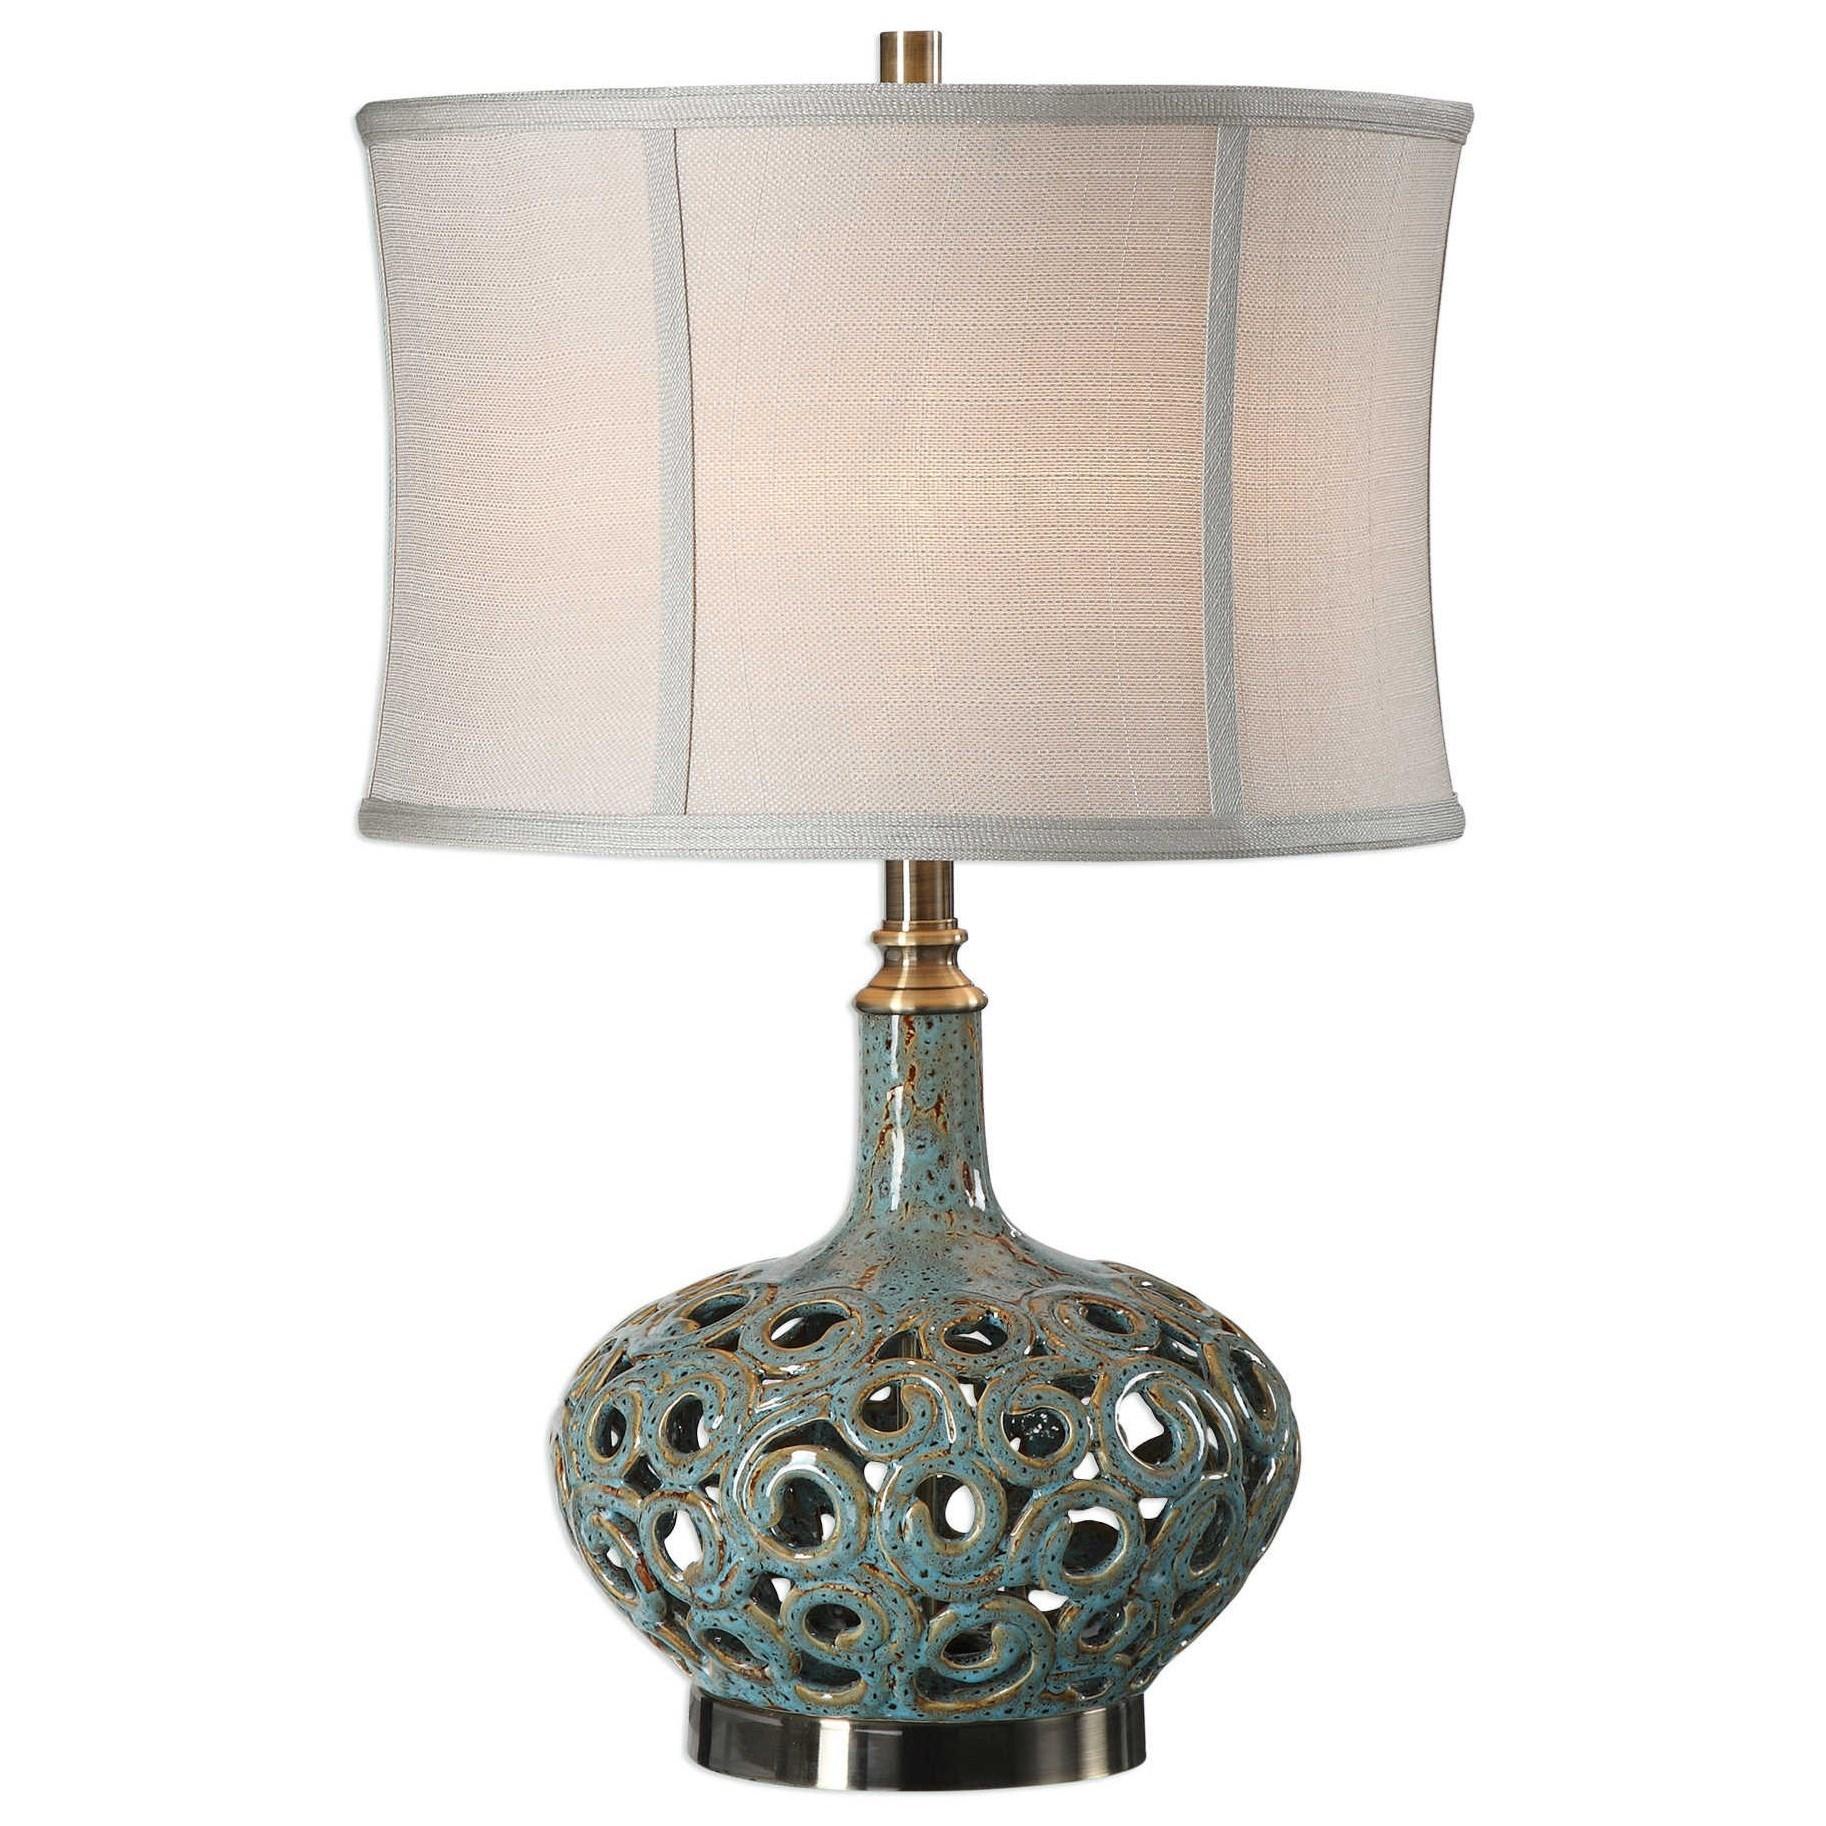 Volu Abstract Swirl Lamp